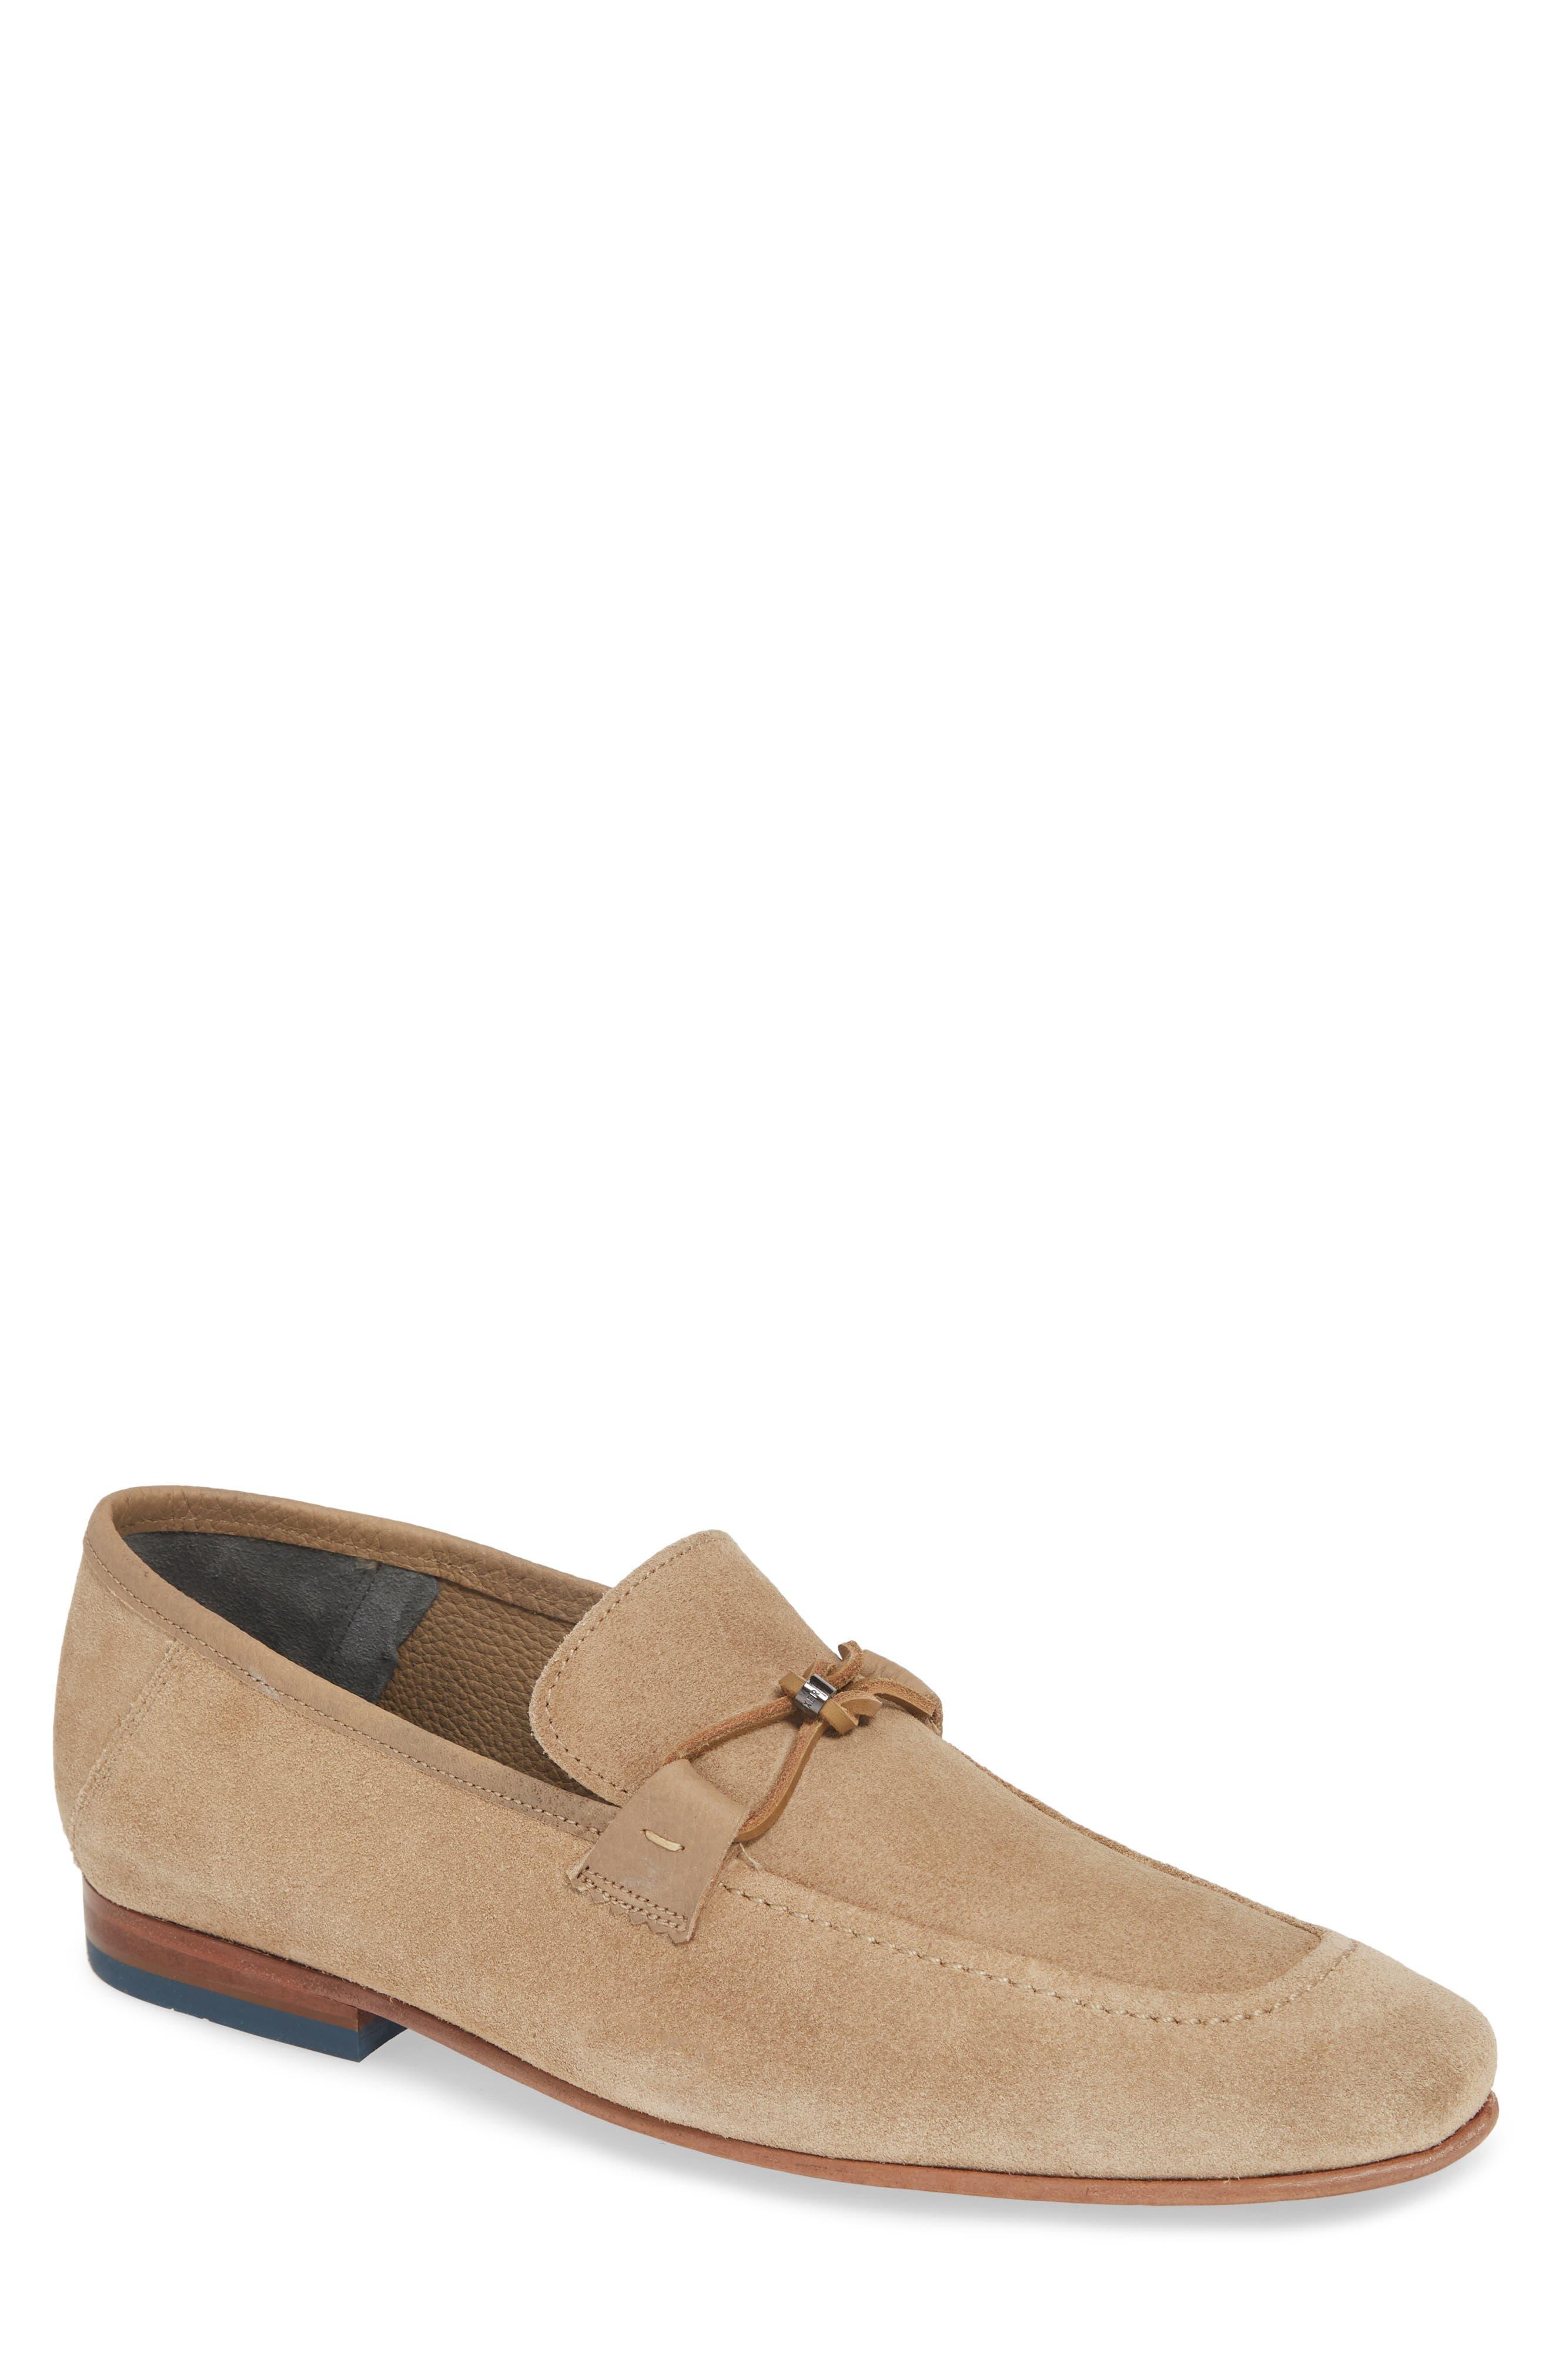 Siblac Bit Loafer, Main, color, LIGHT TAN SUEDE